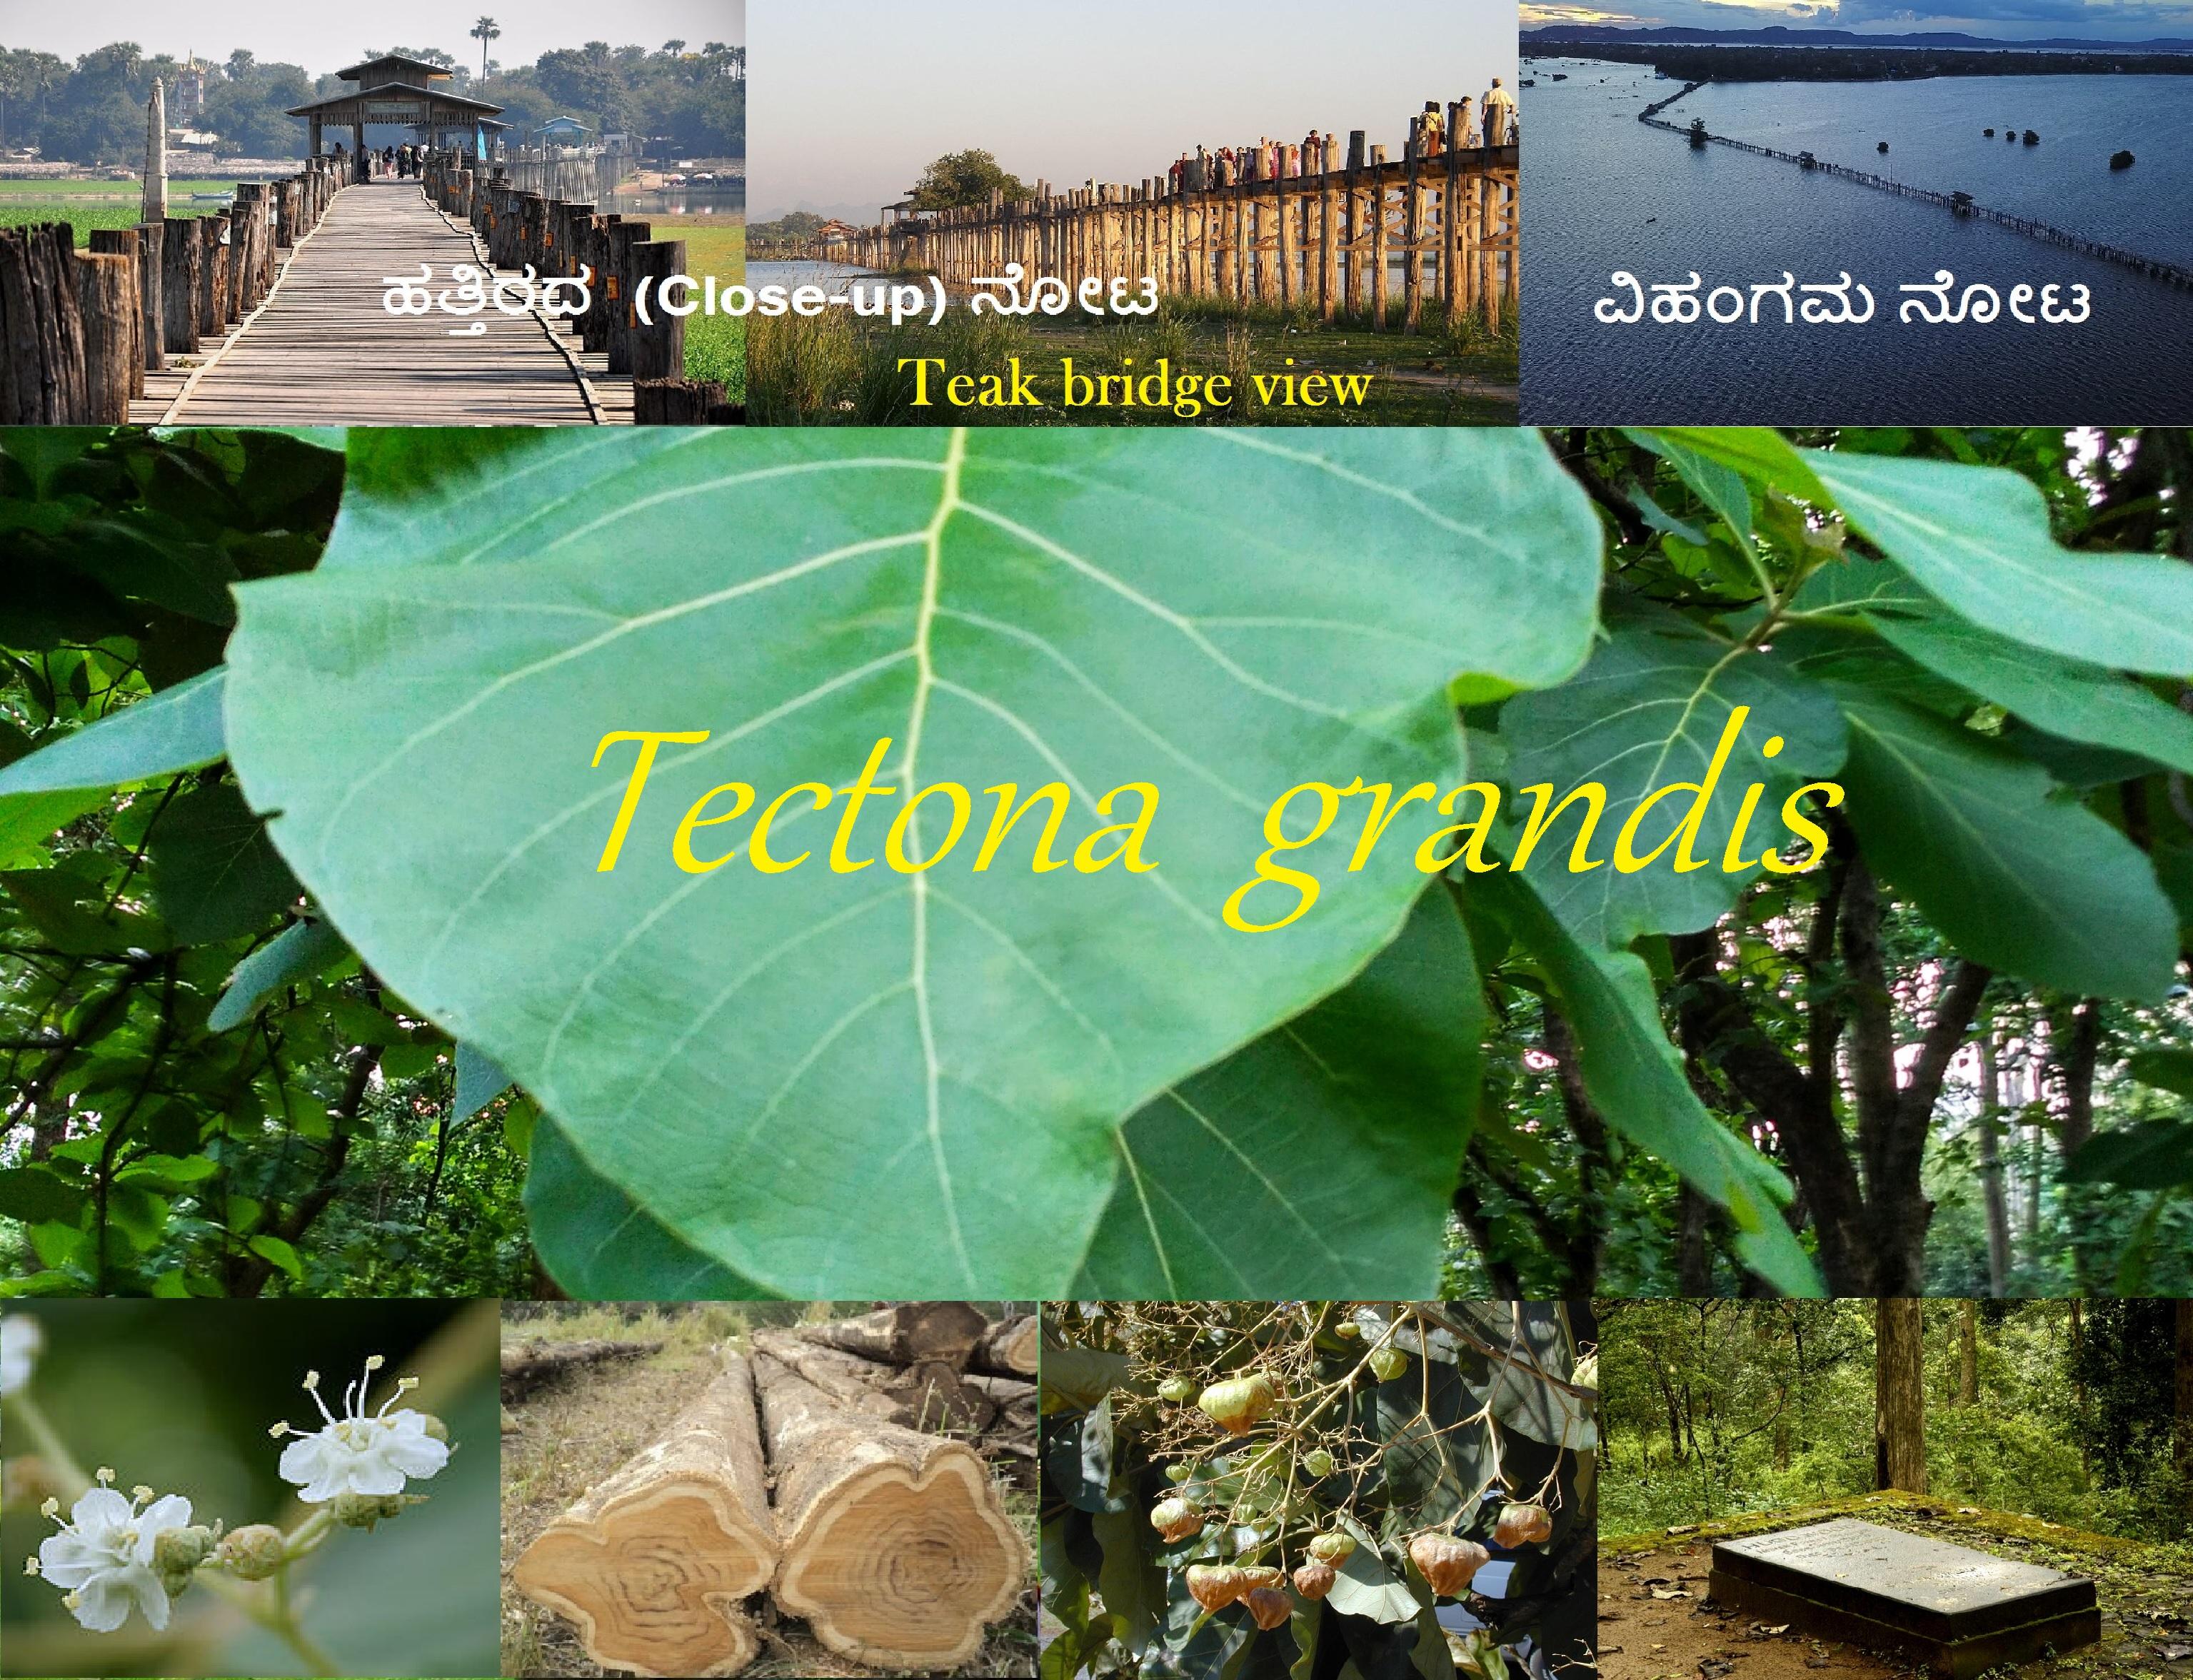 You are currently viewing ಆಧುನಿಕತೆಯ ಹಂಬಲ ಮತ್ತು ಪರಿಸರದ ಜಿಜ್ಞಾಸೆಯನ್ನೂ ಪೋಷಿಸಿದ ತೇಗ : Tectona grandis